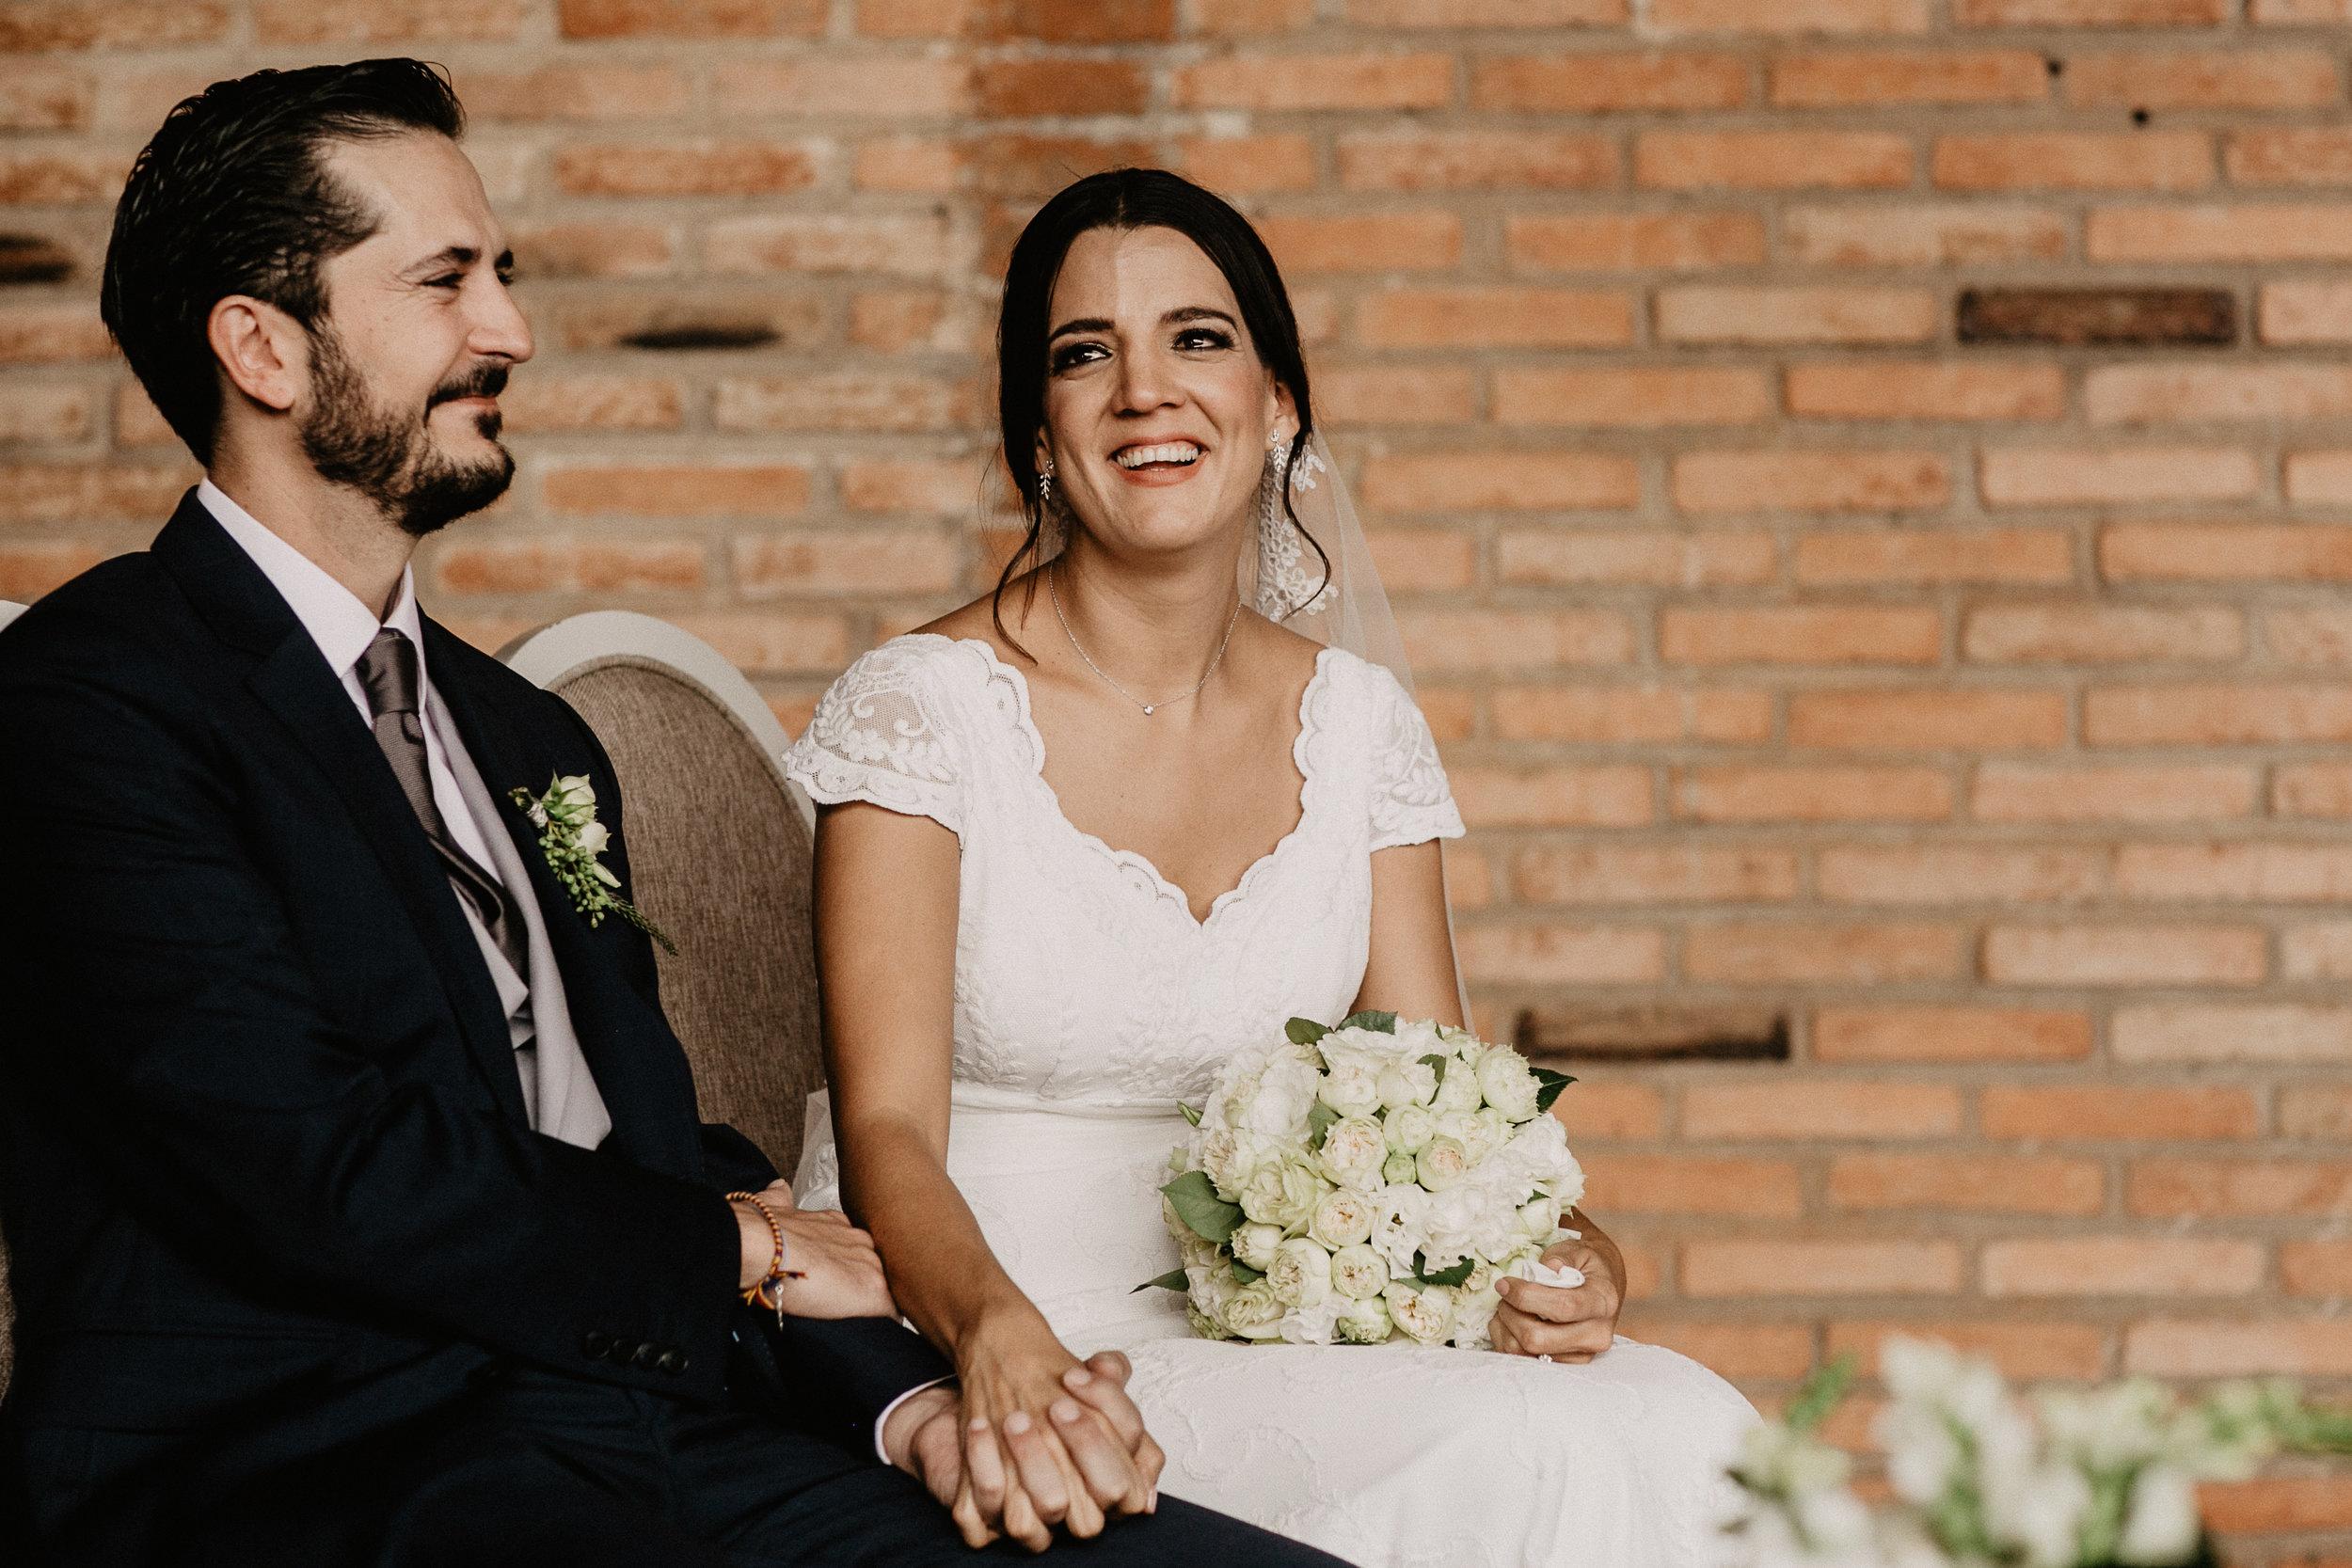 alfonso_flores_destination_wedding_photographer_pau_alonso_409.JPG